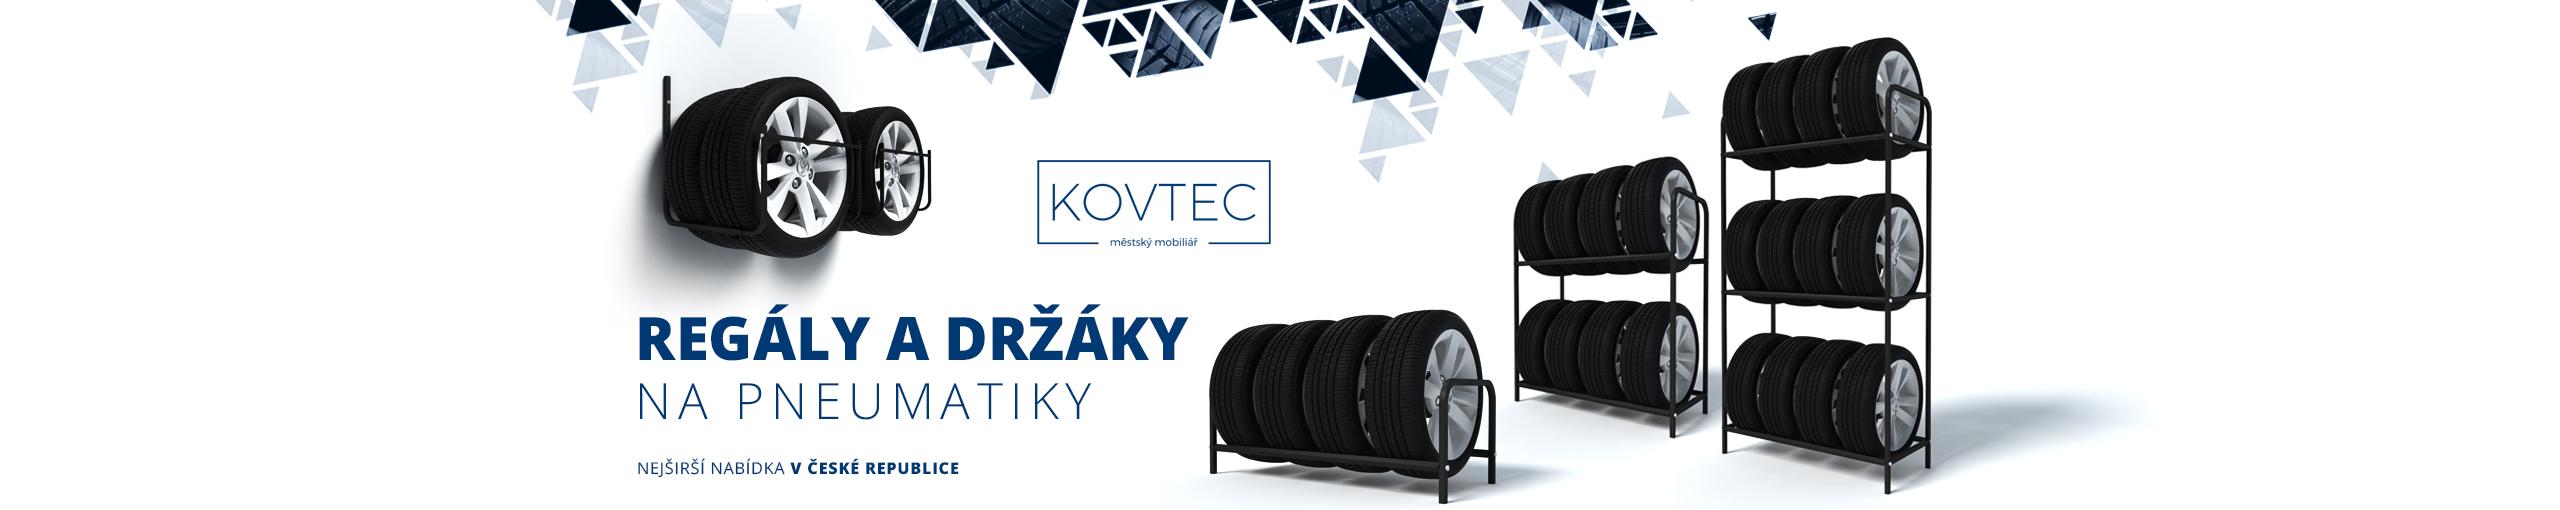 Stojany-a-regaly-na-pneumatiky-levne-do-garaze-drzaky-do-gareze-na-pneumatiky-levne-skladem-